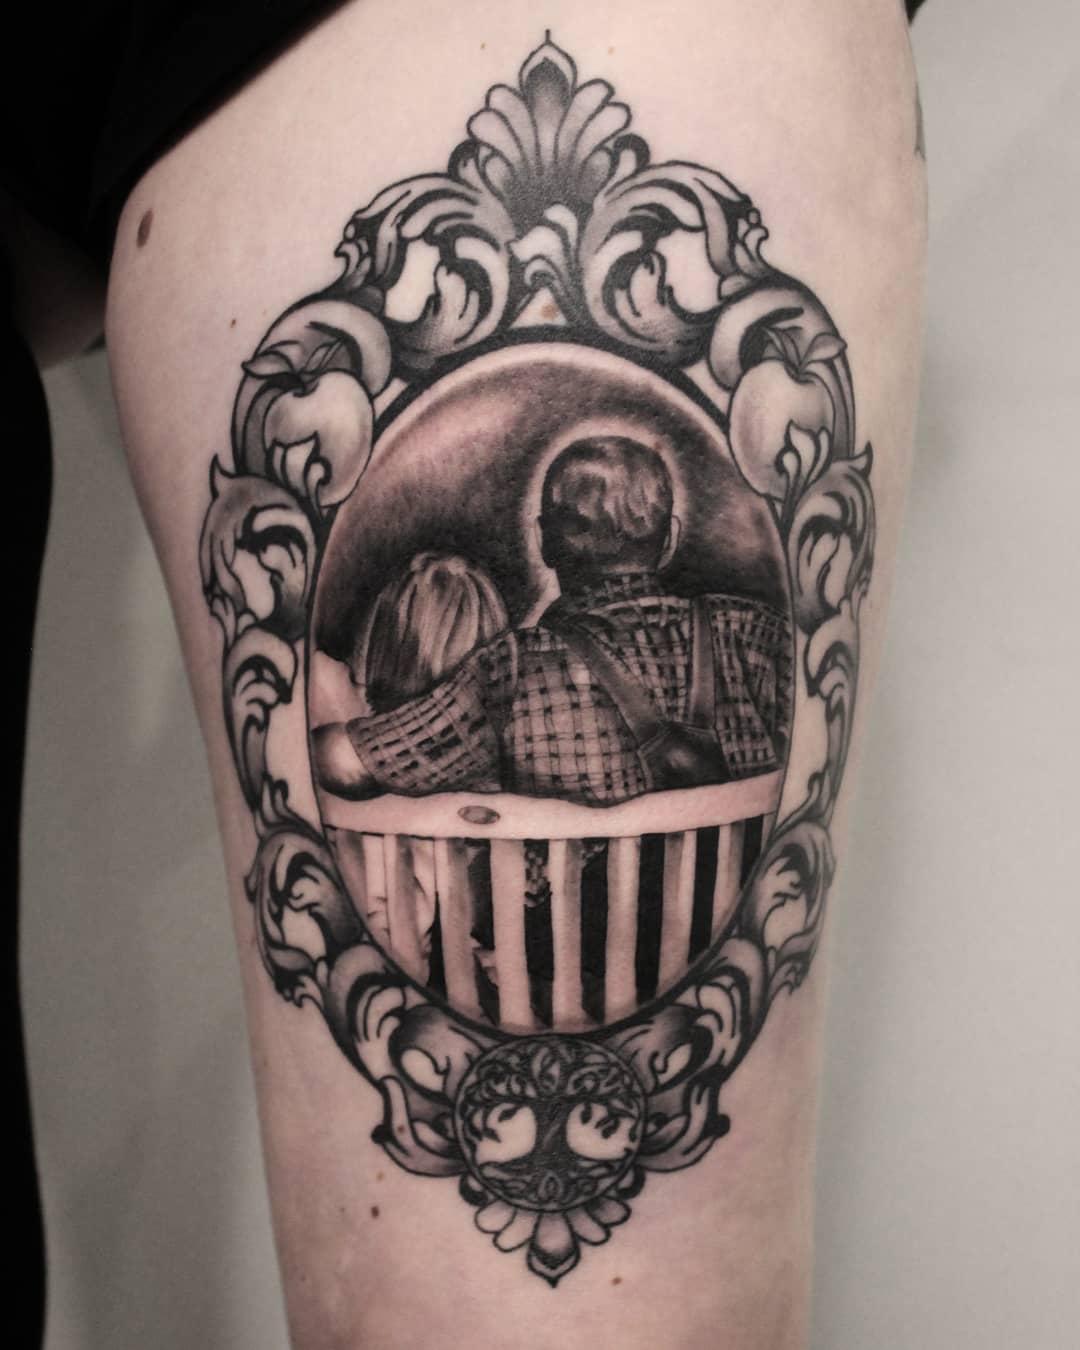 Thank you steffi! #germantattooers #tattooworkers #tattoolife #germanartist #bla